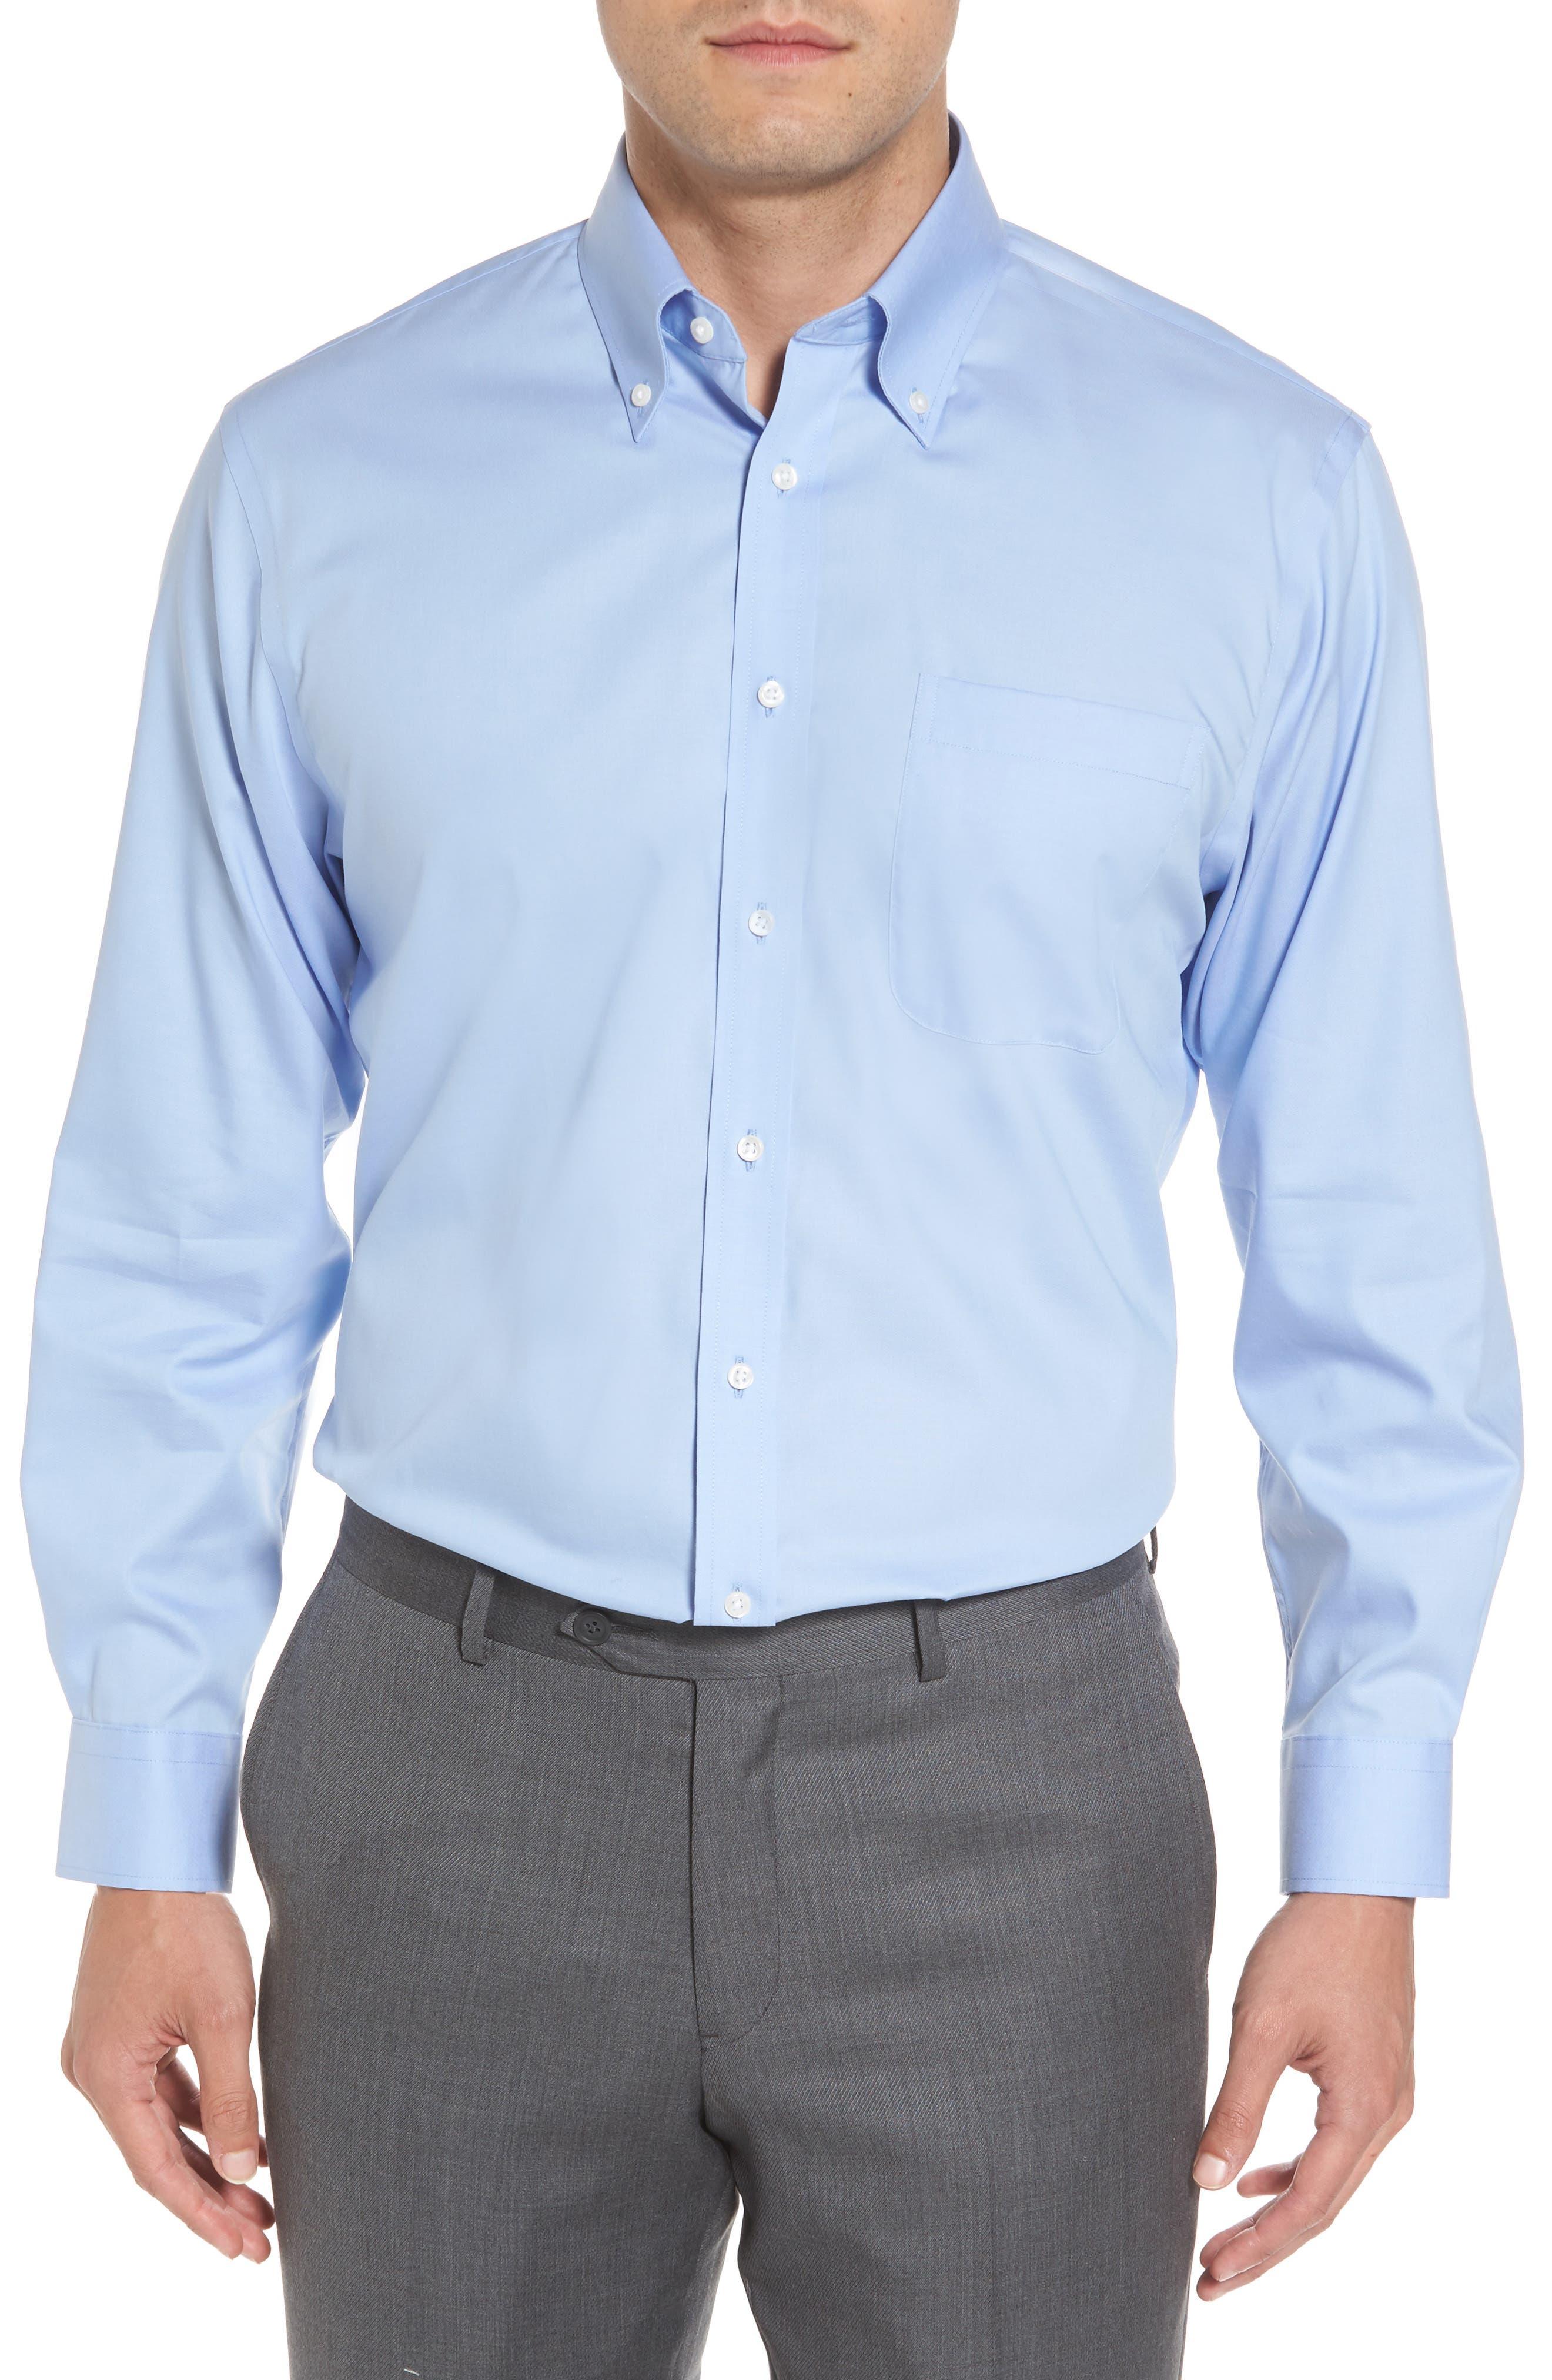 Dress blue white shirt